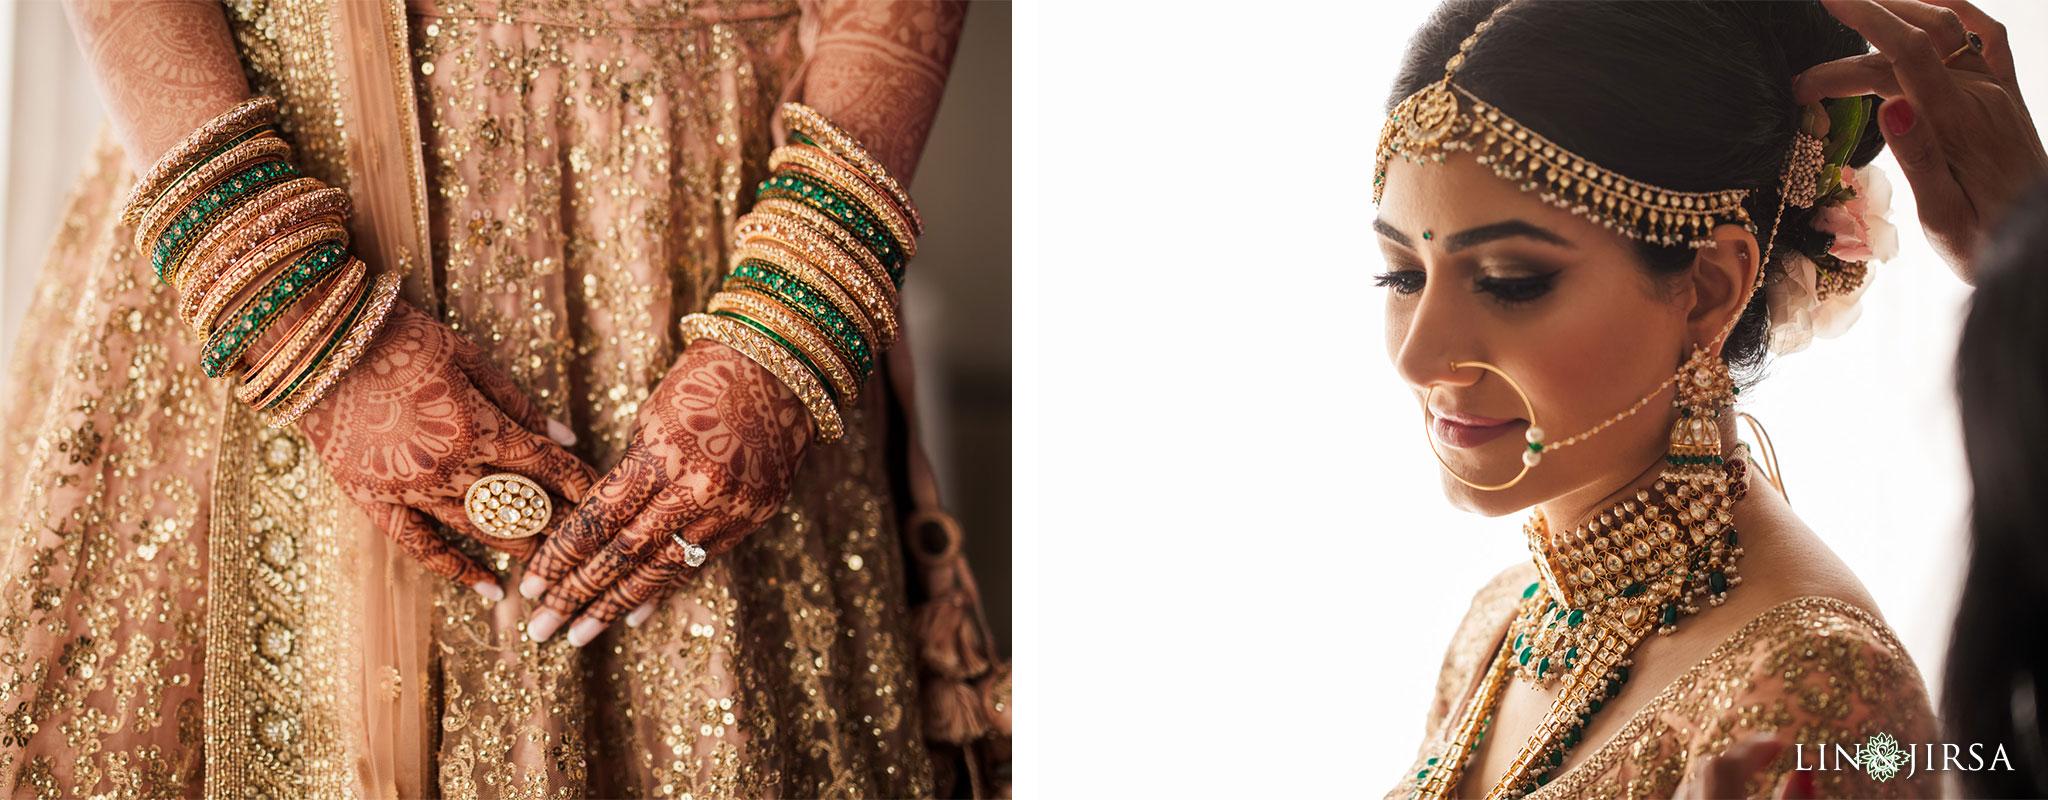 006 terranea resort palos verdes indian wedding photography